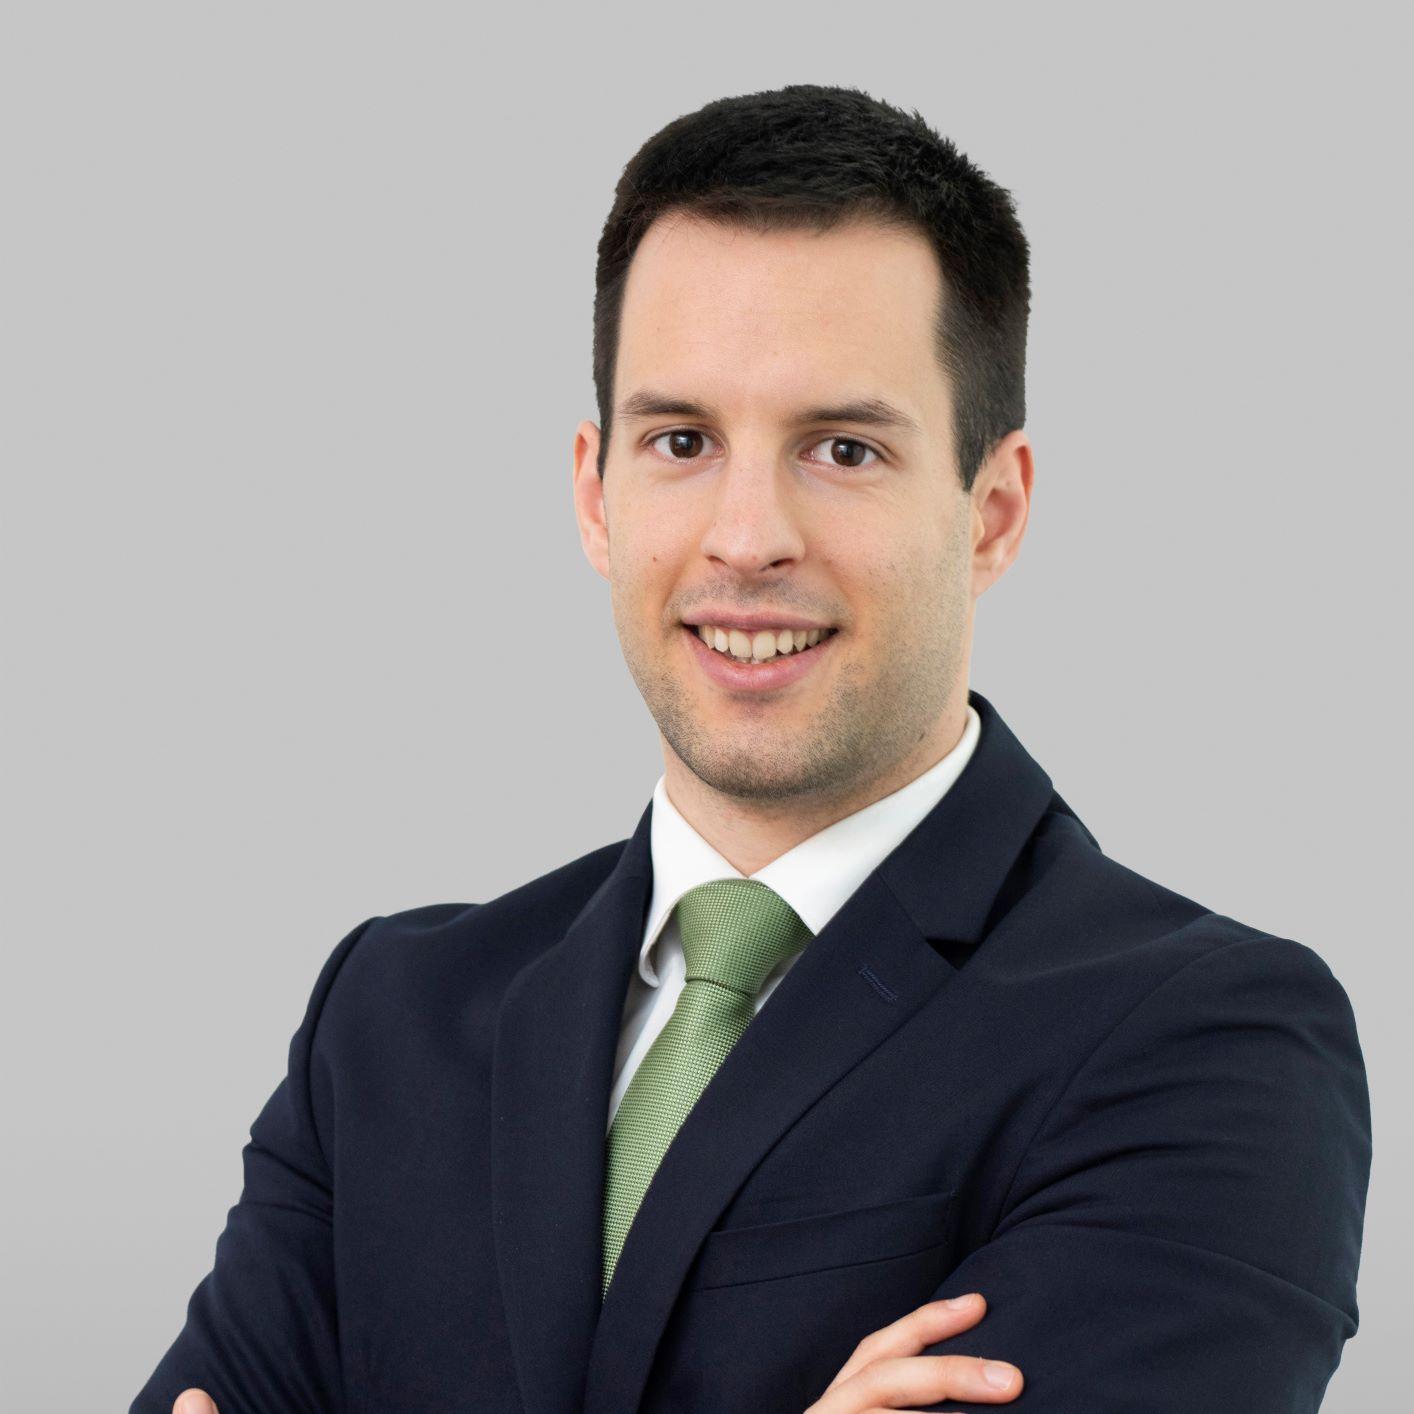 André Filipe Morais